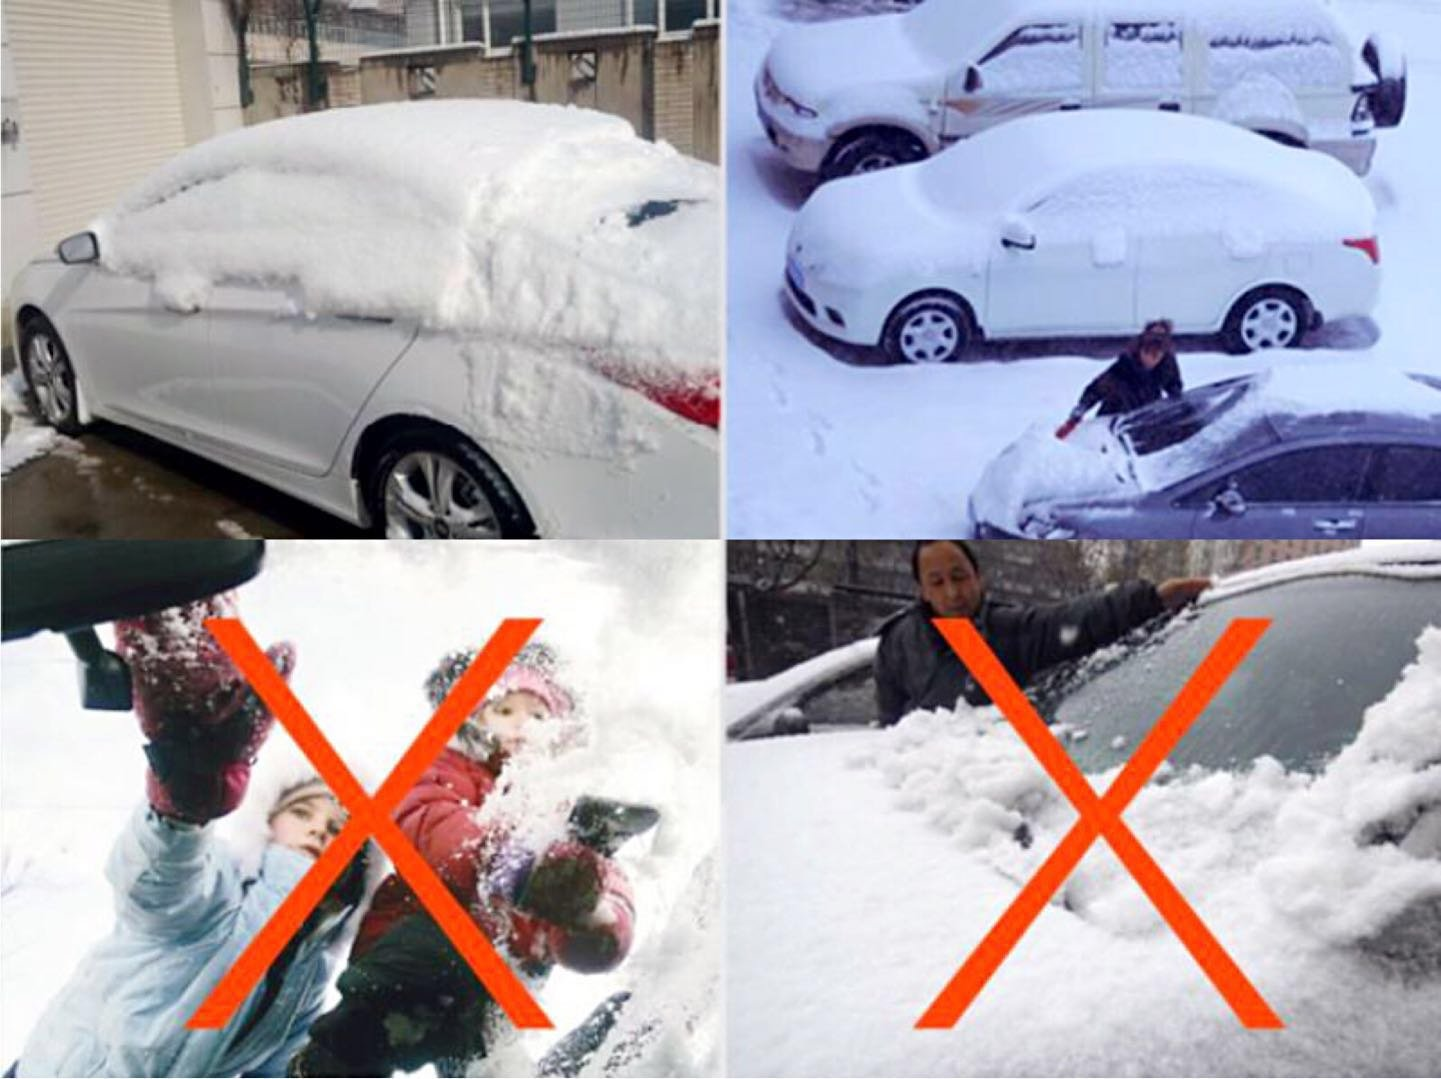 Safe View Half Car Cover Top Waterproof All  Weather/Windproof/Dustproof/Windshield Cover Snow Ice Winter Summer for  Sedan SUV (Sedan 3L(173